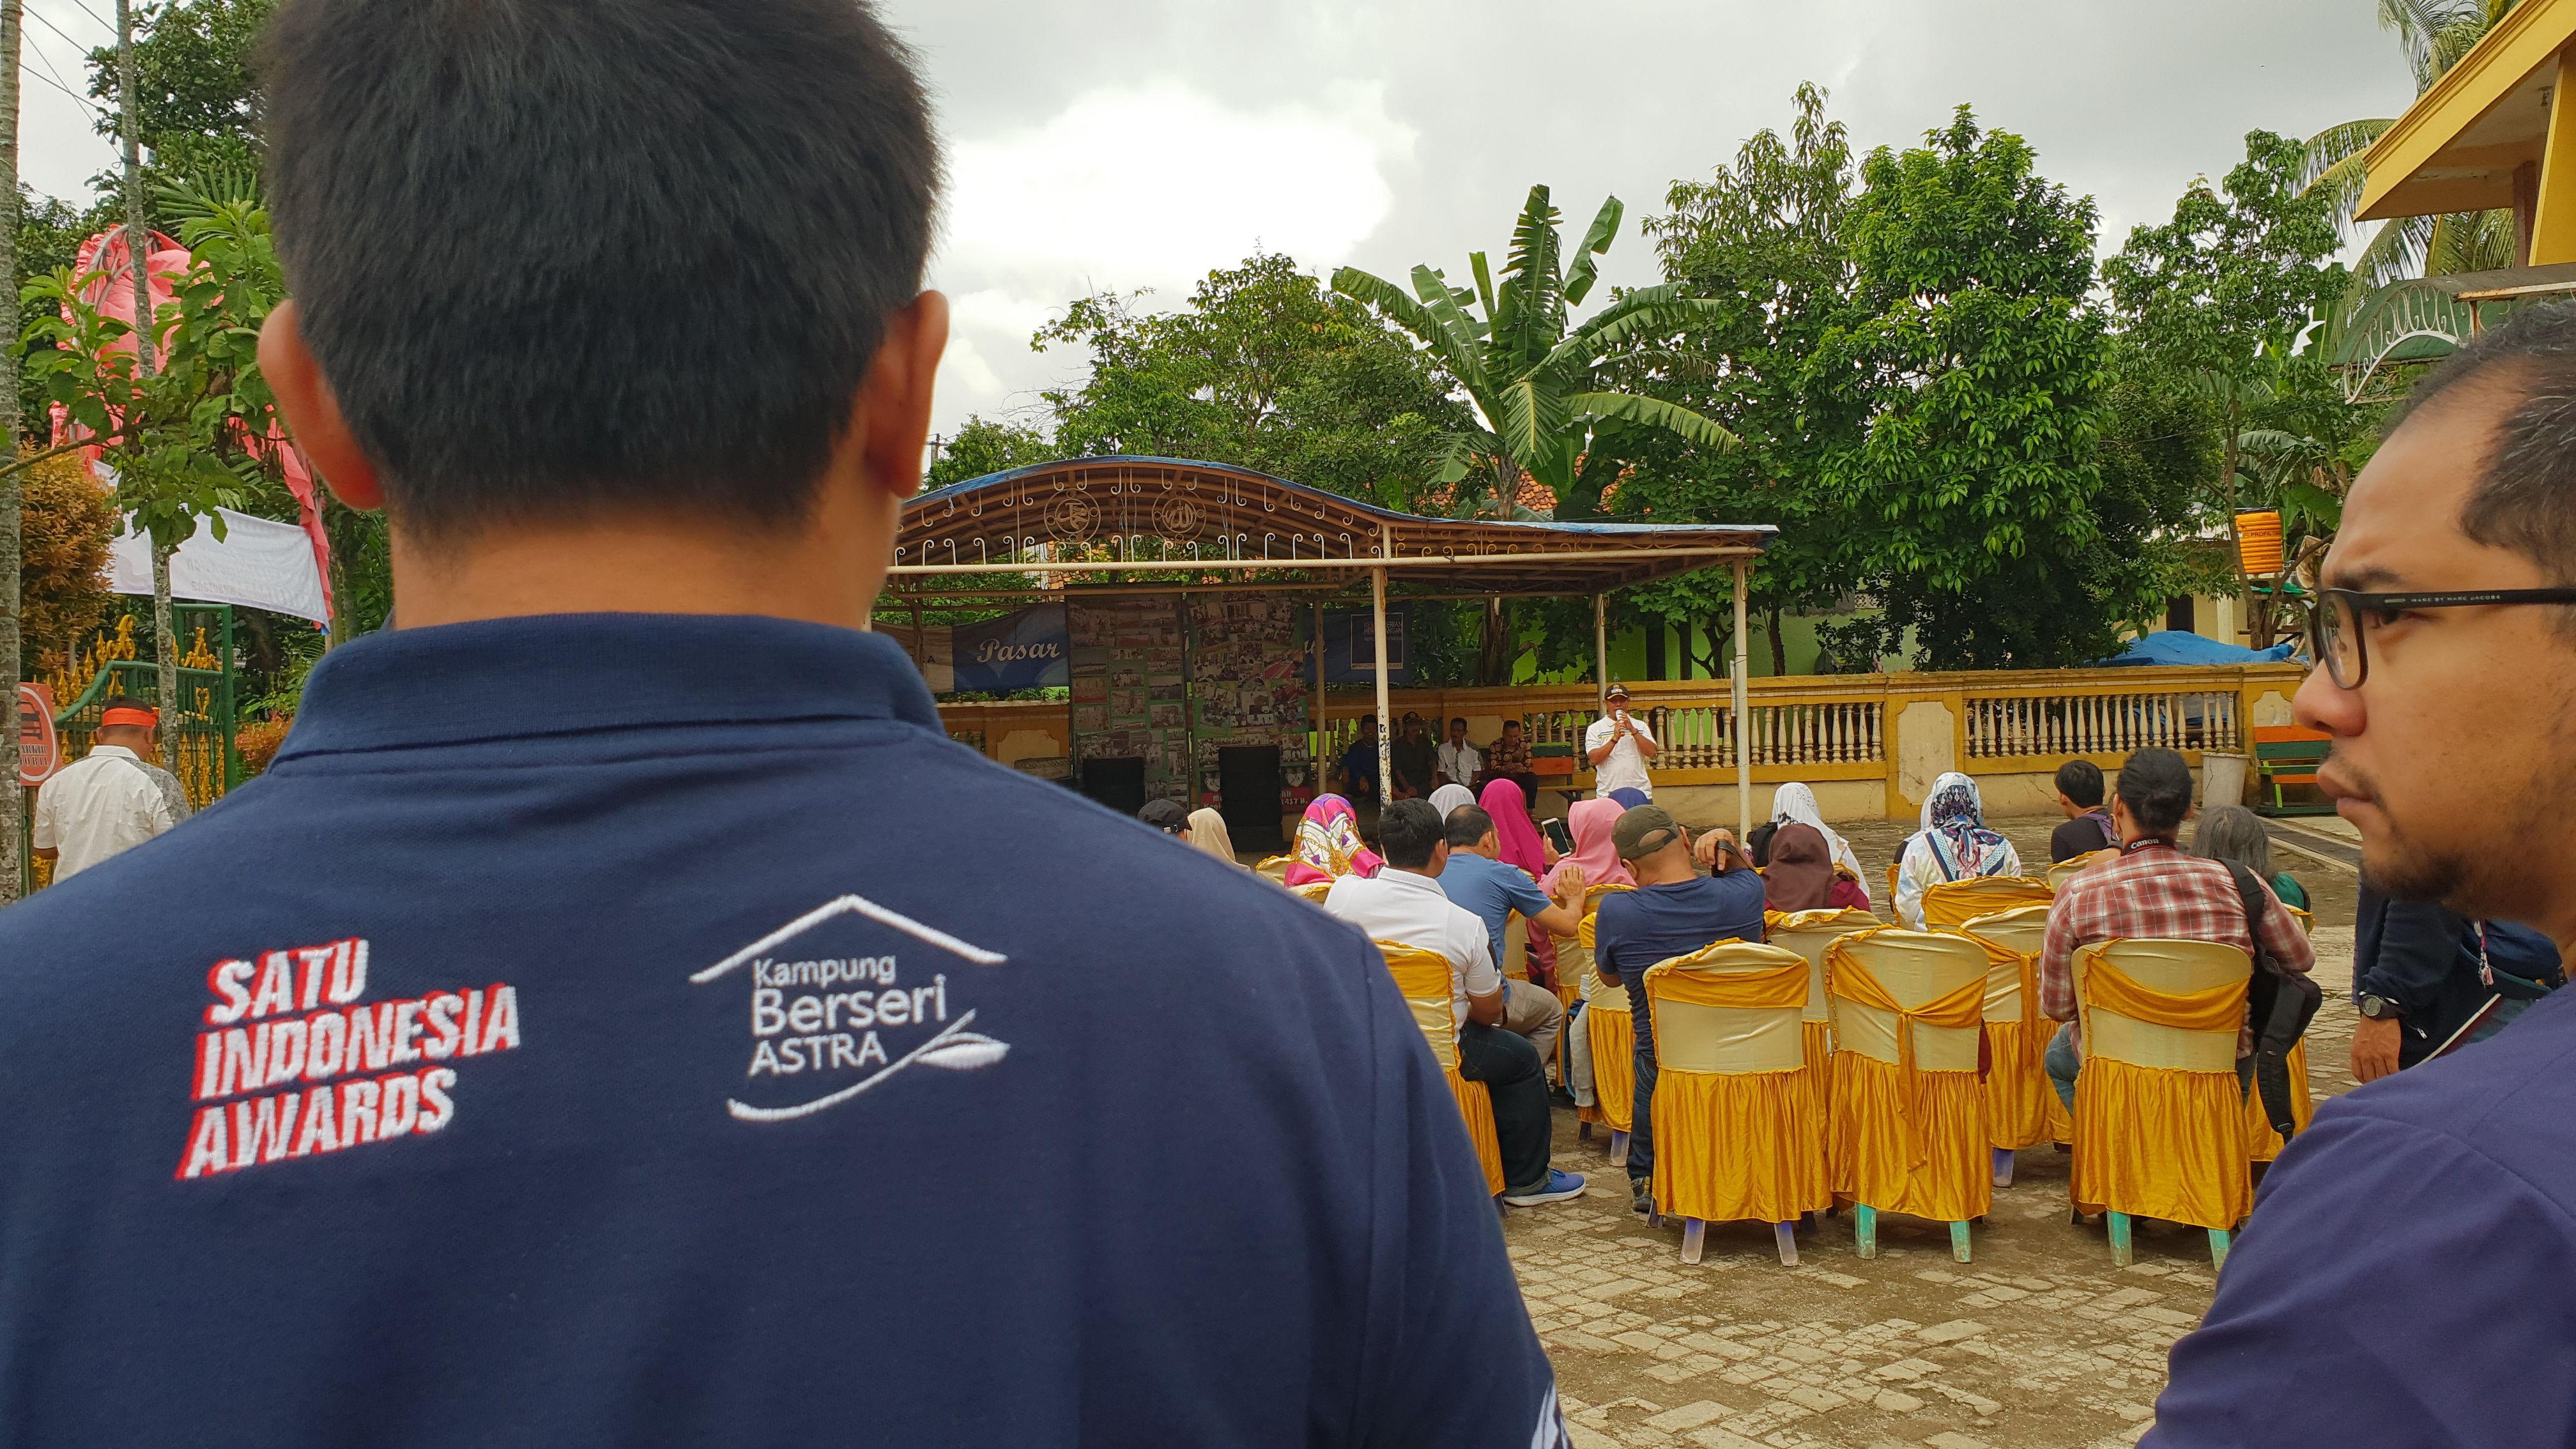 Astra International, Daihatsu, Toyota, Honda, Kampung Sawah, Lengkong Kulon, Pandeglang, Stunting, Ekonomi, Kampung Berseri Astra